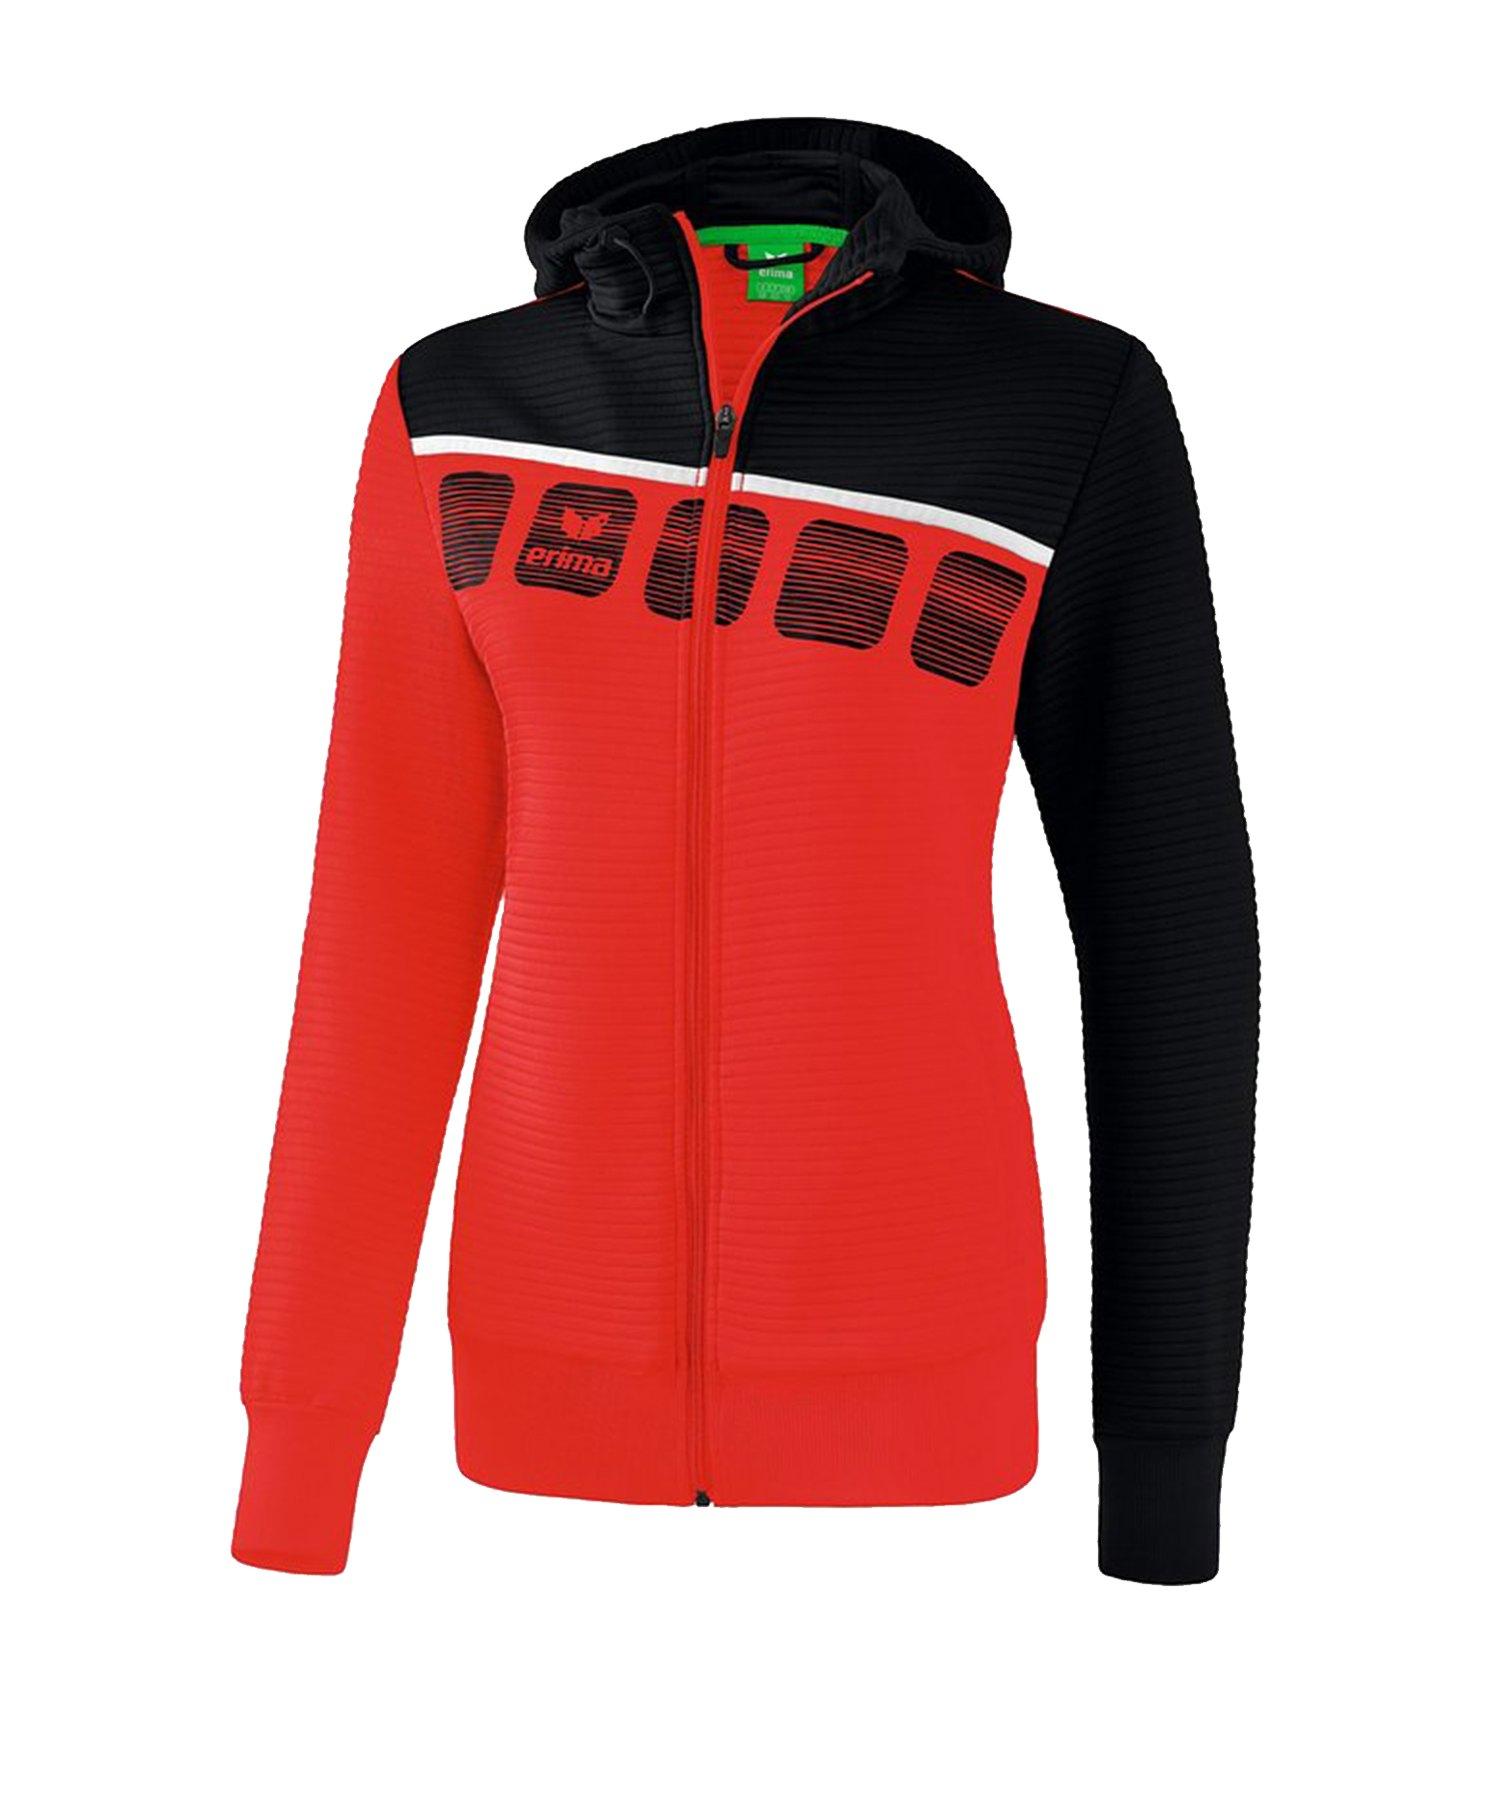 Erima 5-C Trainingsjacke Kapuze Damen Rot Schwarz - Rot